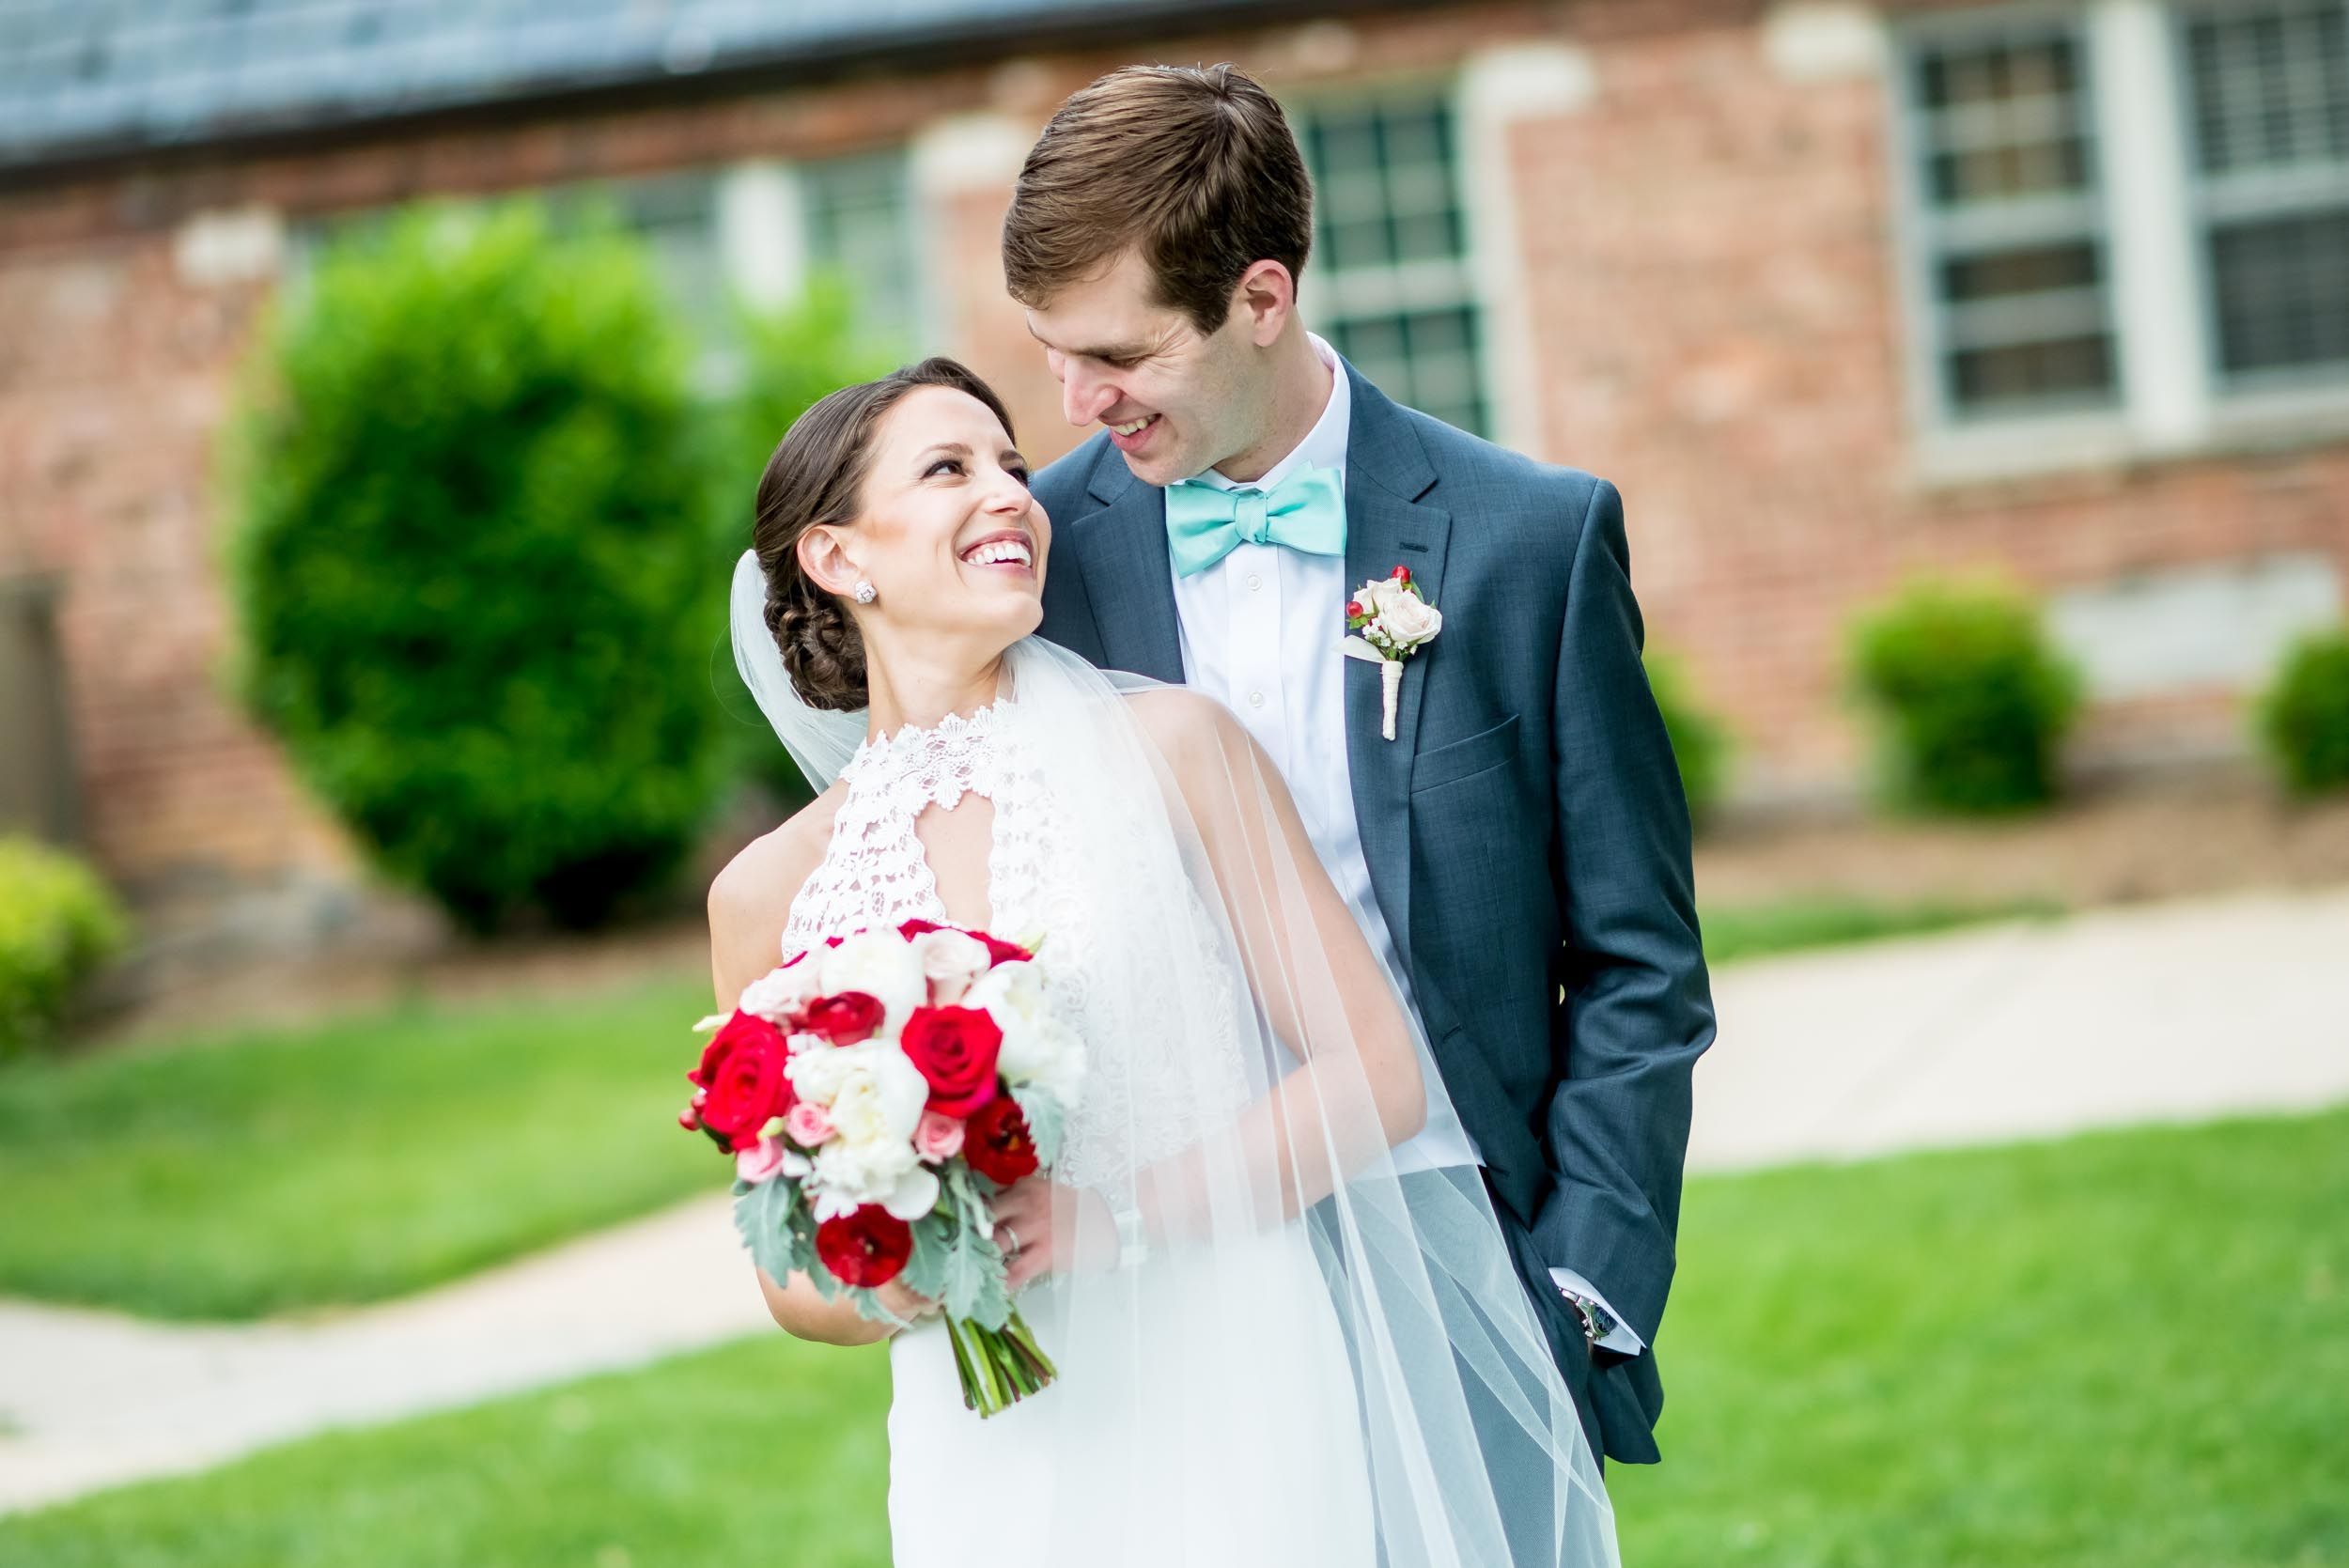 dc+metro+wedding+photographer+vadym+guliuk+photography+wedding+bride+and+groom-2052.jpg